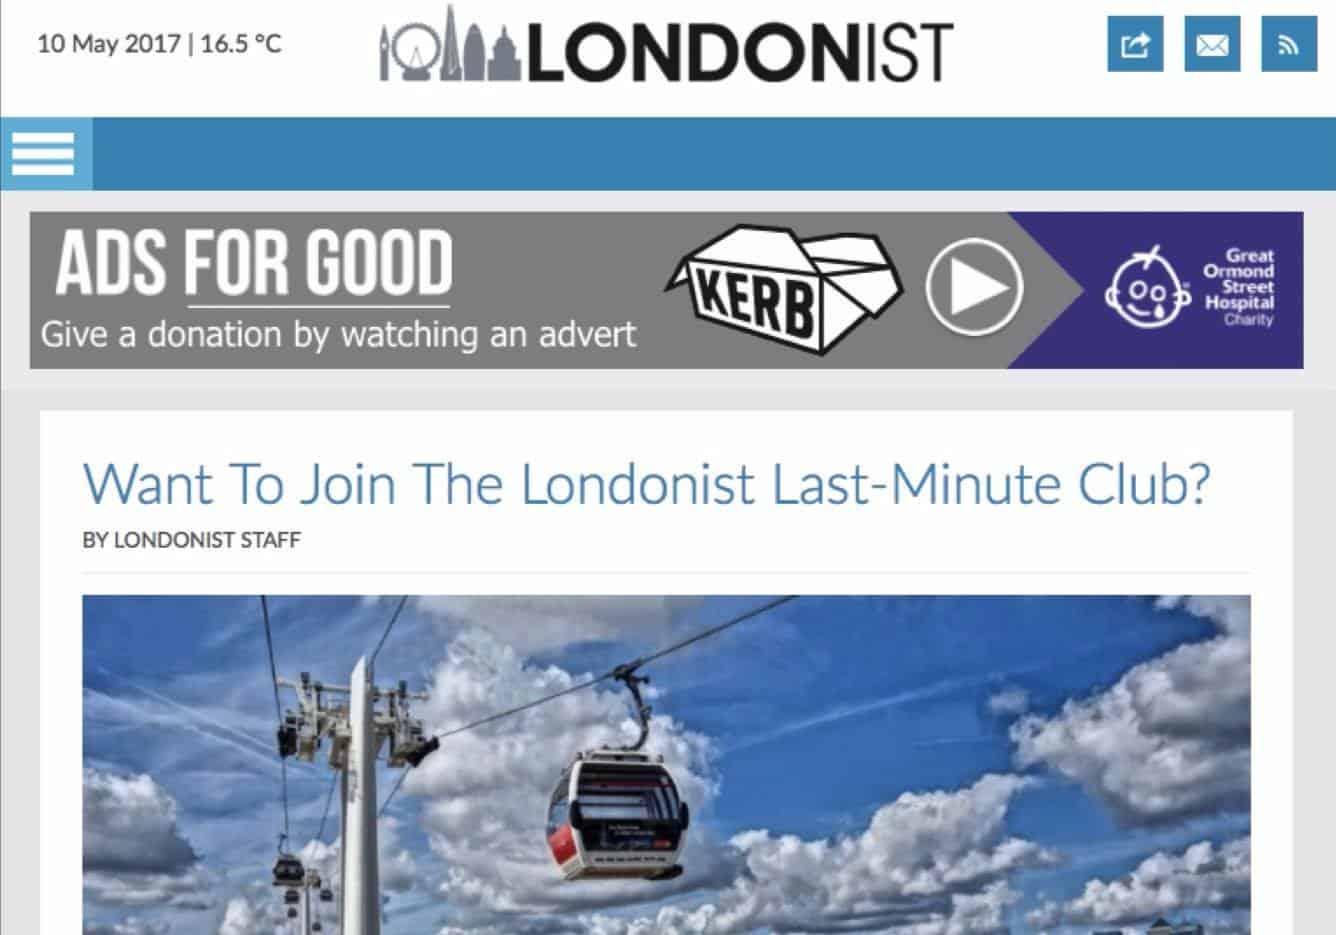 Donate 4.0 ไม่ต้องบริจาคเงิน แต่บริจาคด้วยการดูโฆษณาแทนได้